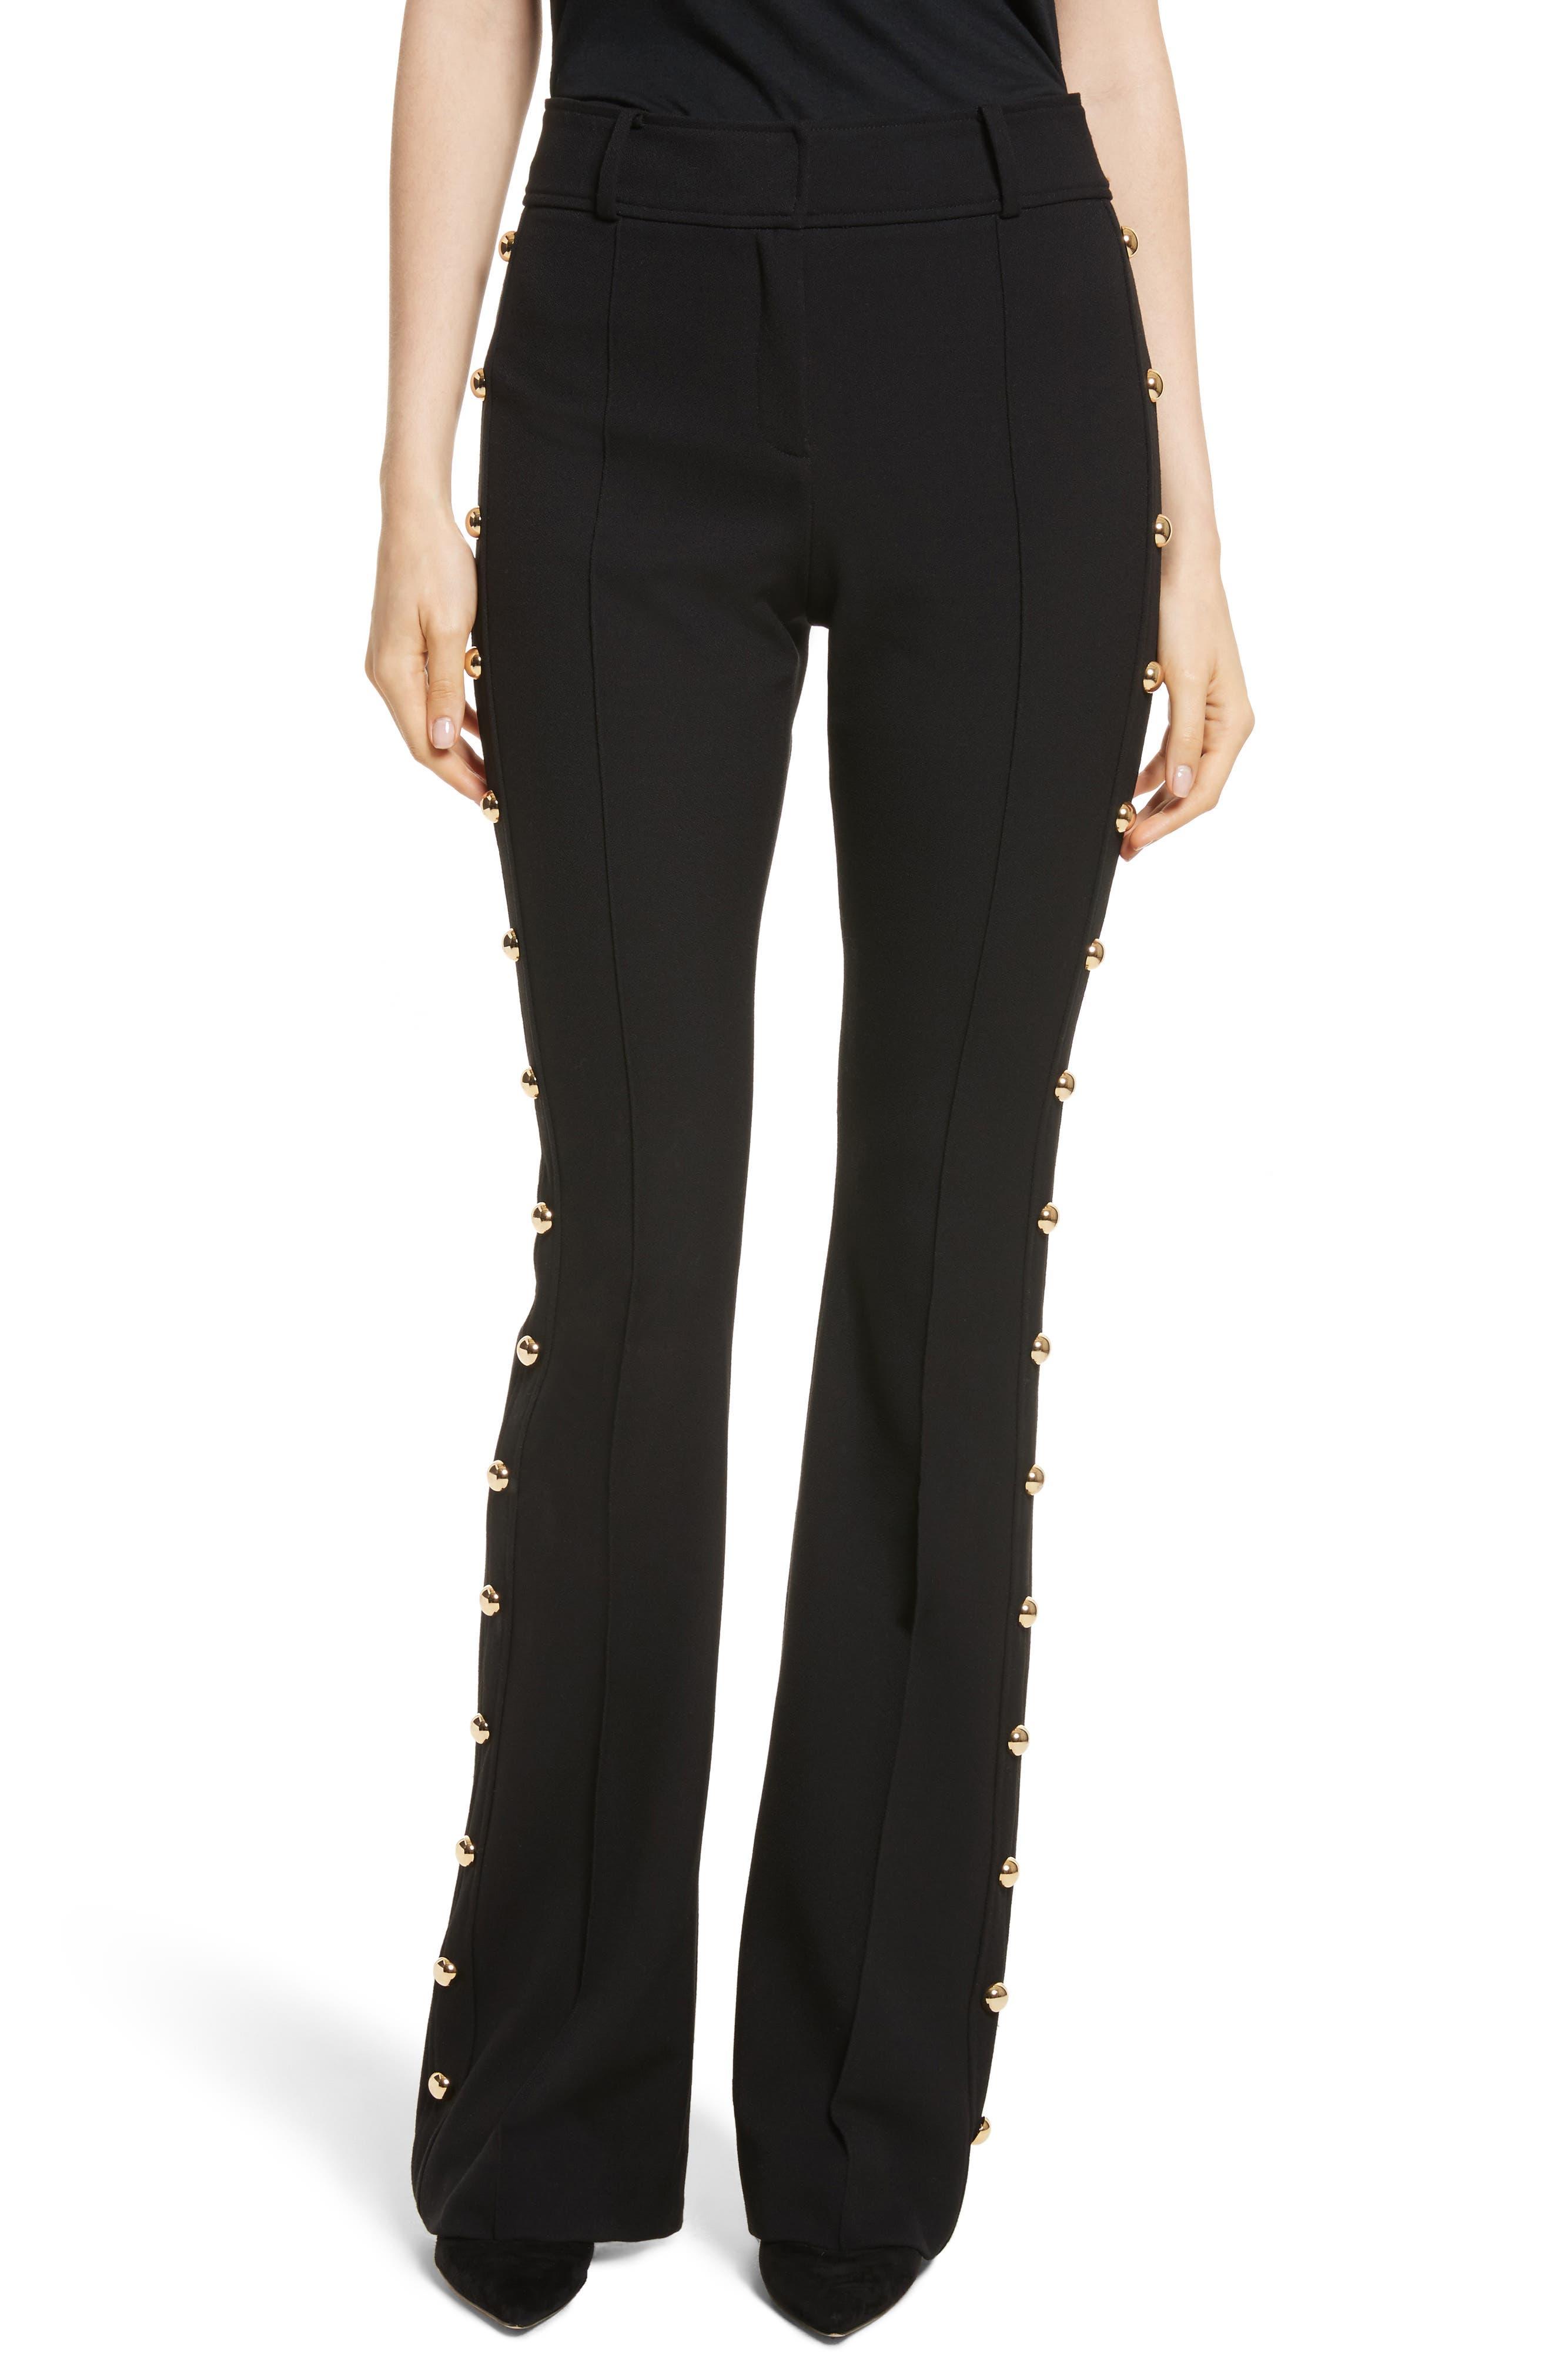 Lennox Trousers,                         Main,                         color, Black